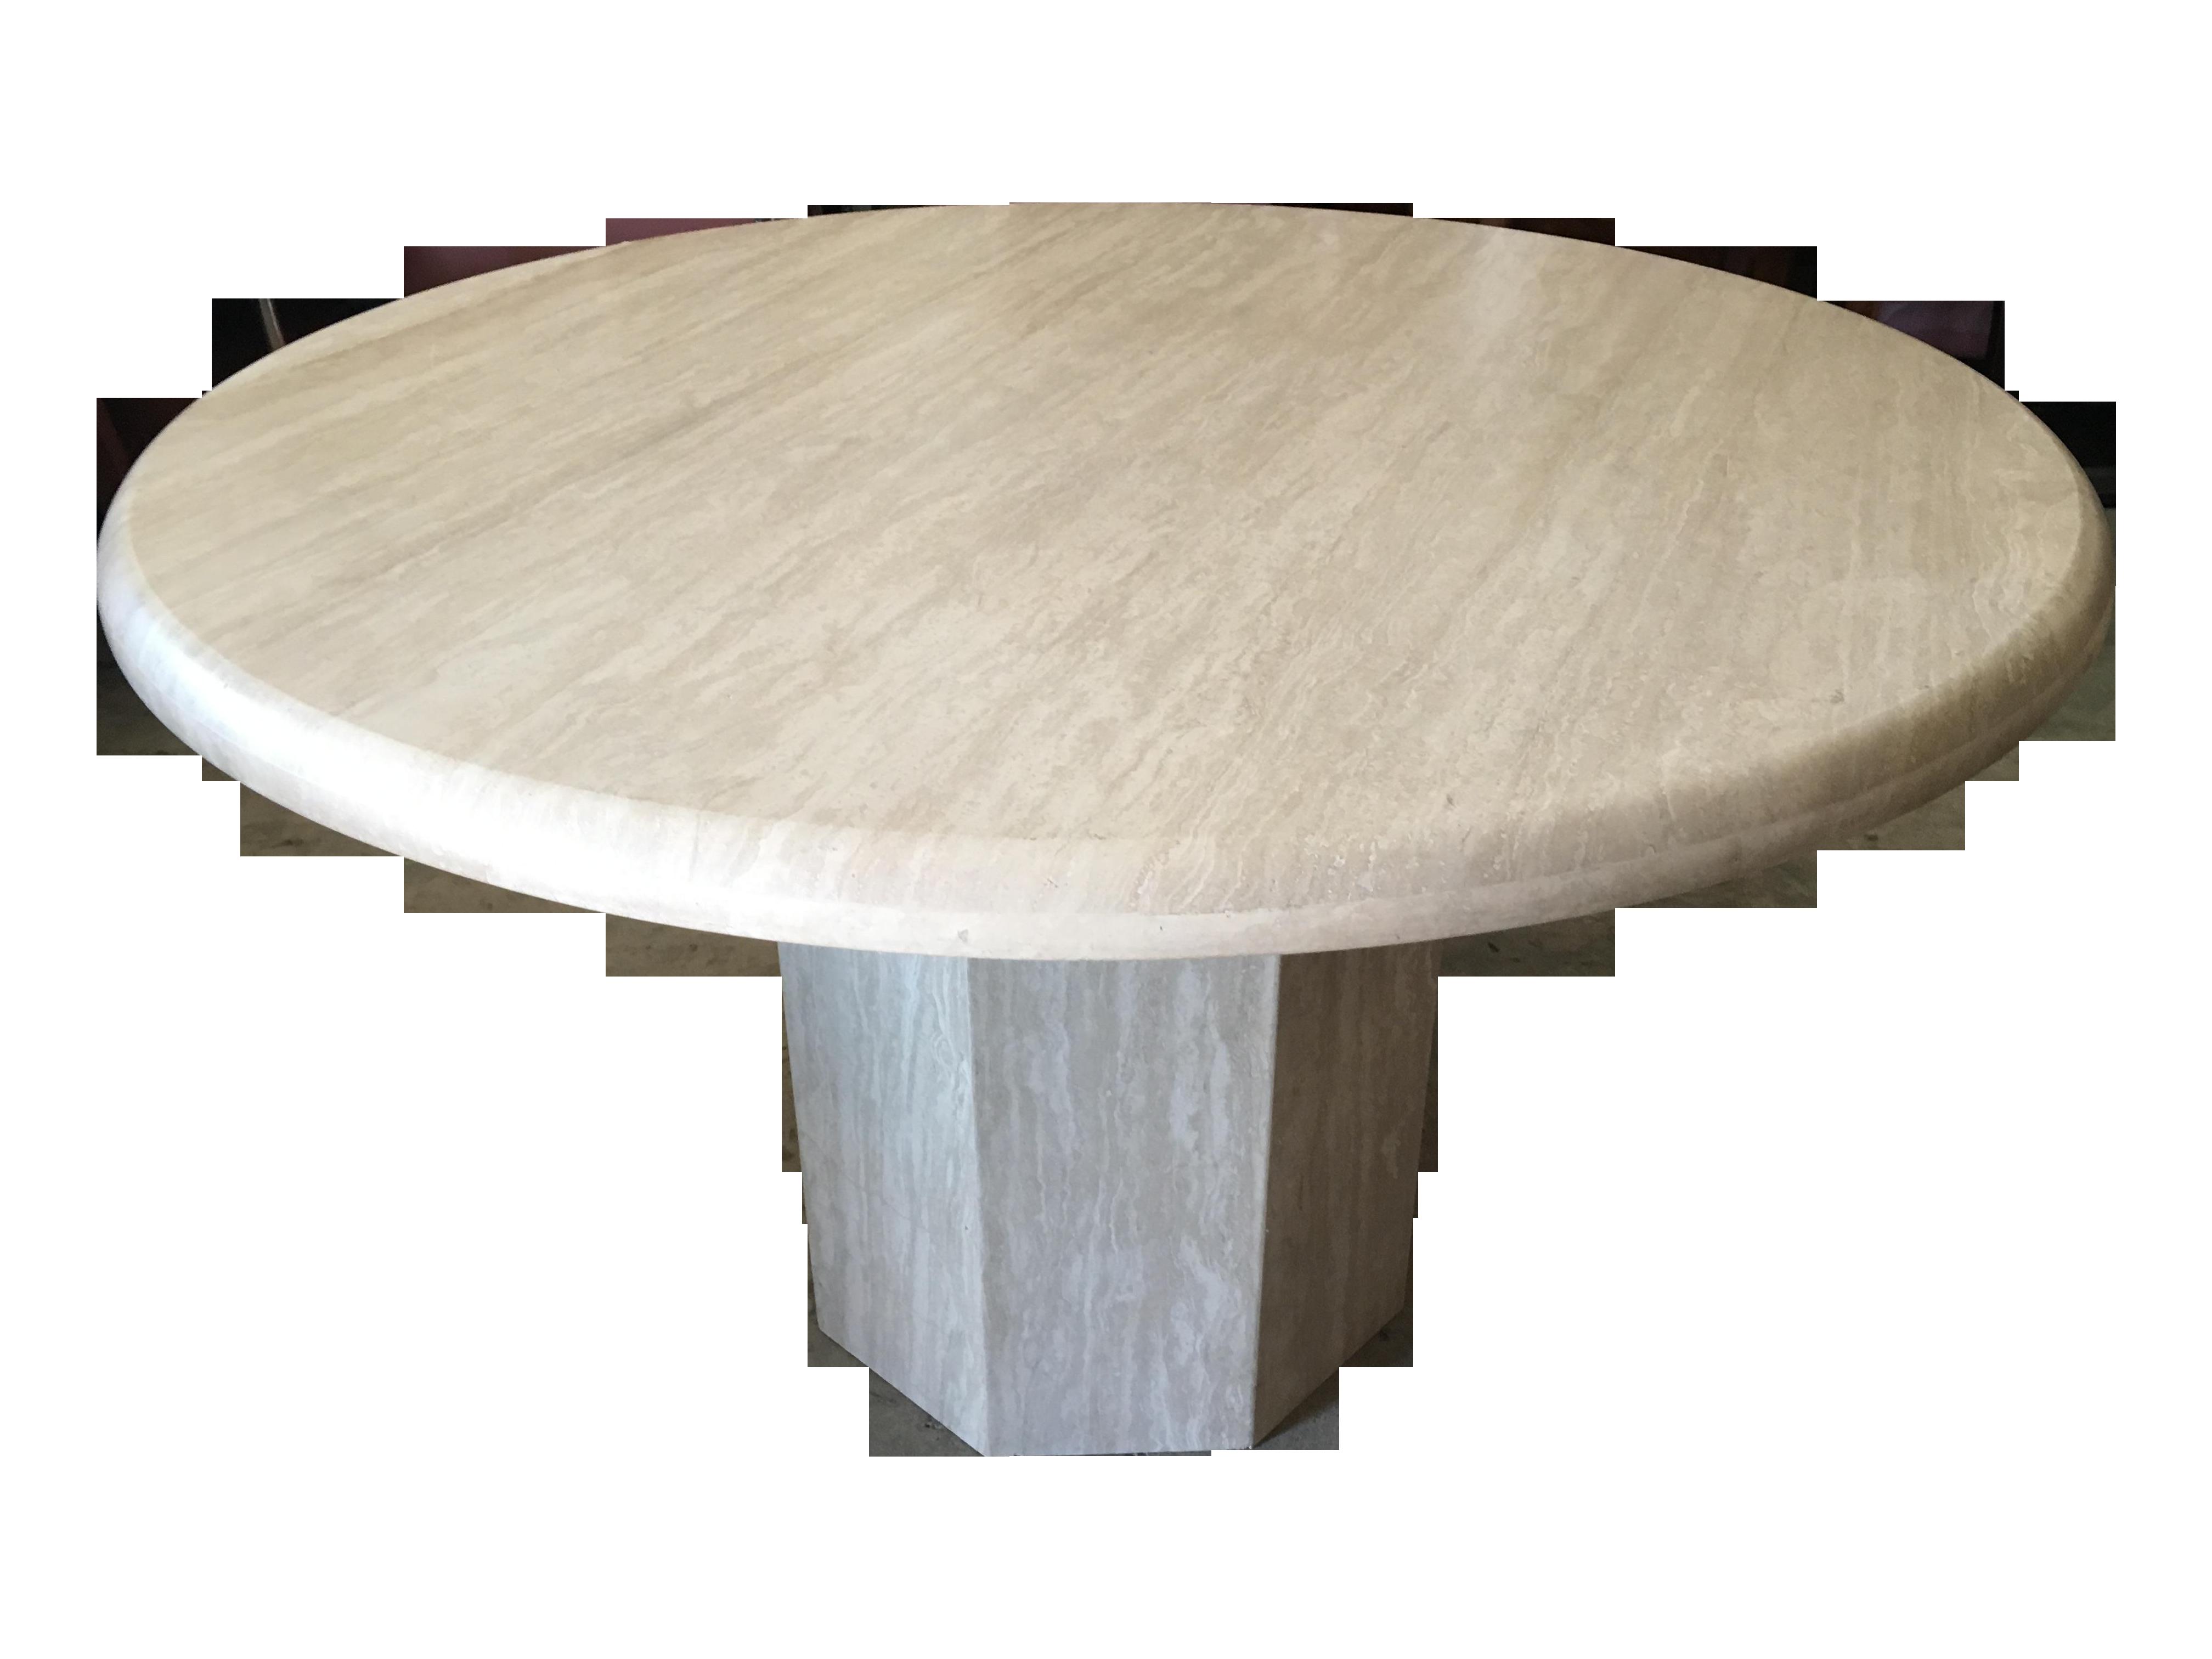 Round Italian Solid Travertine Dining Table Chairish